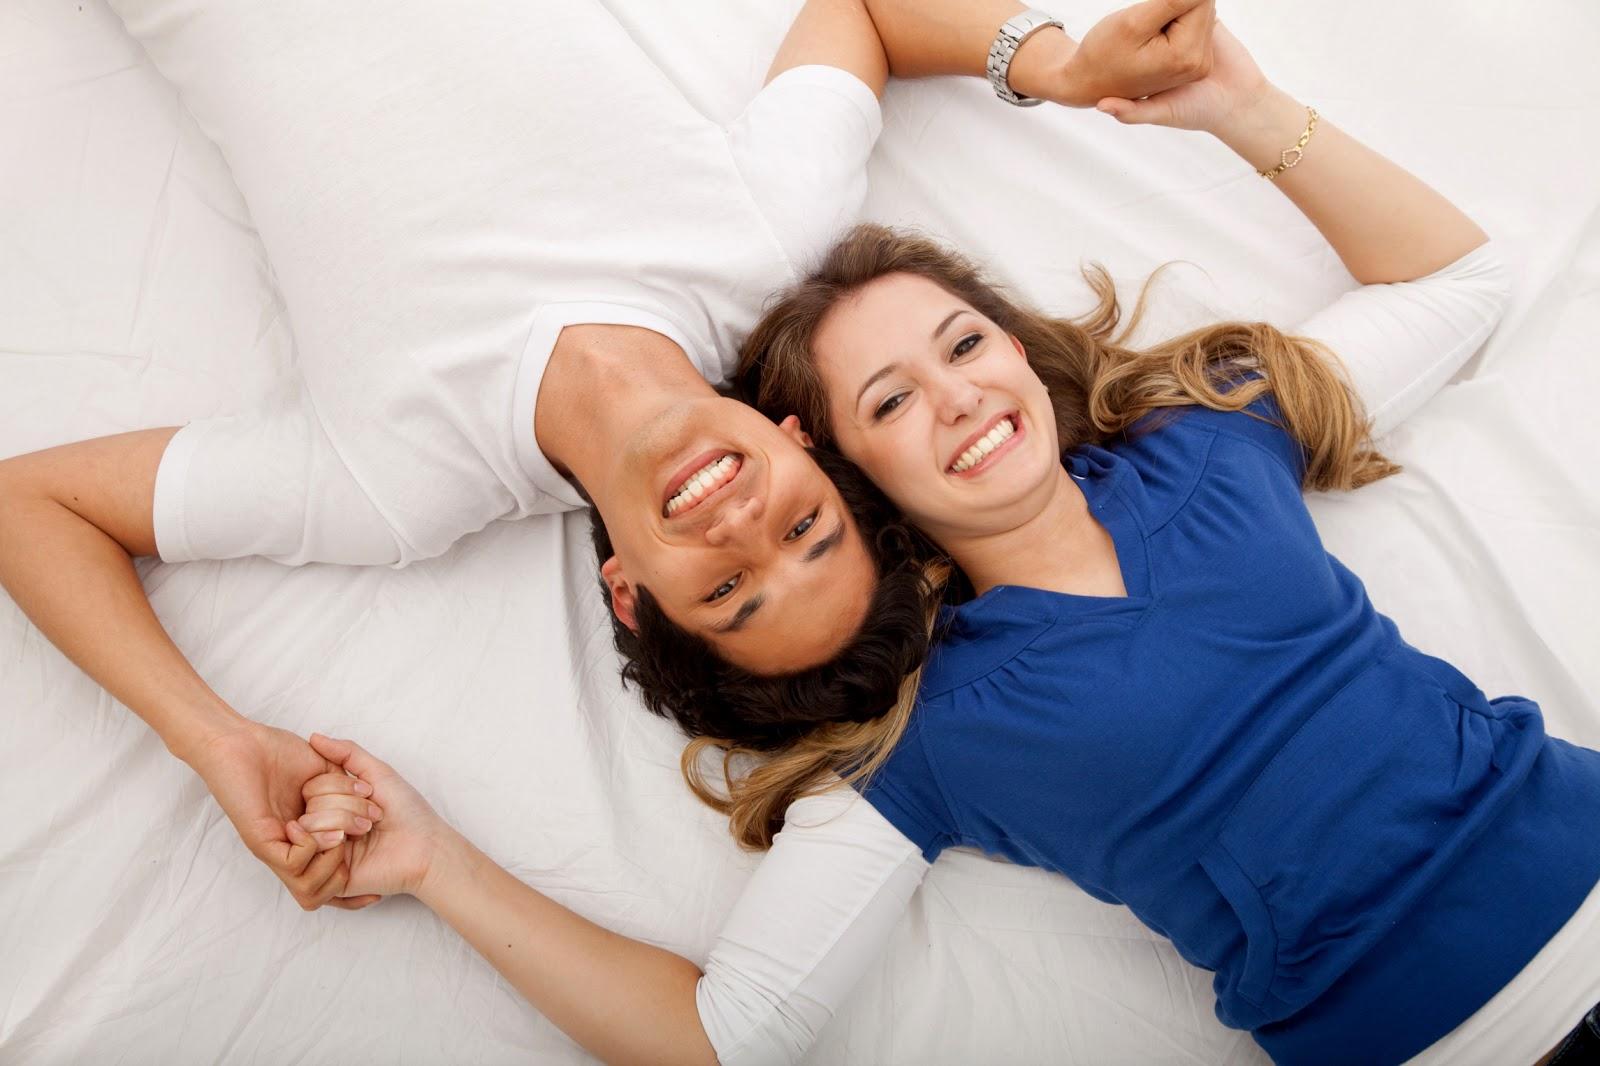 Matrimonio Biblia Paralela : Fortaleciendo matrimonios: 8 puntos sobre el matrimonio tim challies